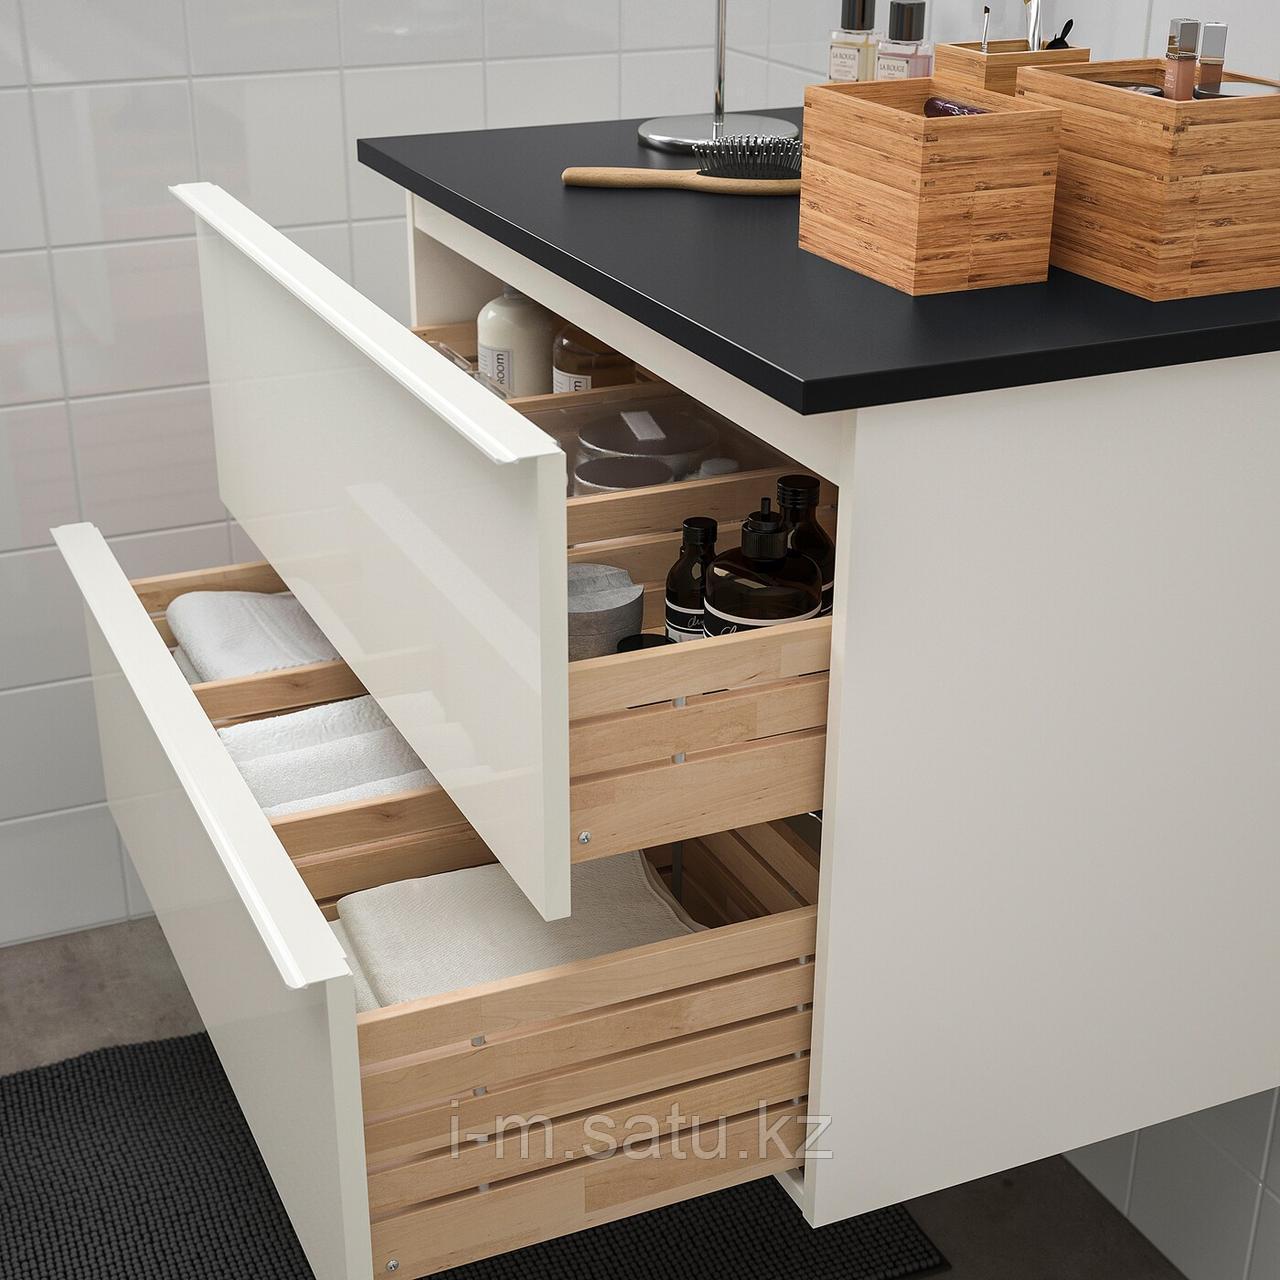 ГОДМОРГОН / ТОЛКЕН Шкаф для раковины с 2 ящ, глянцевый белый, антрацит, 82x49x60 см